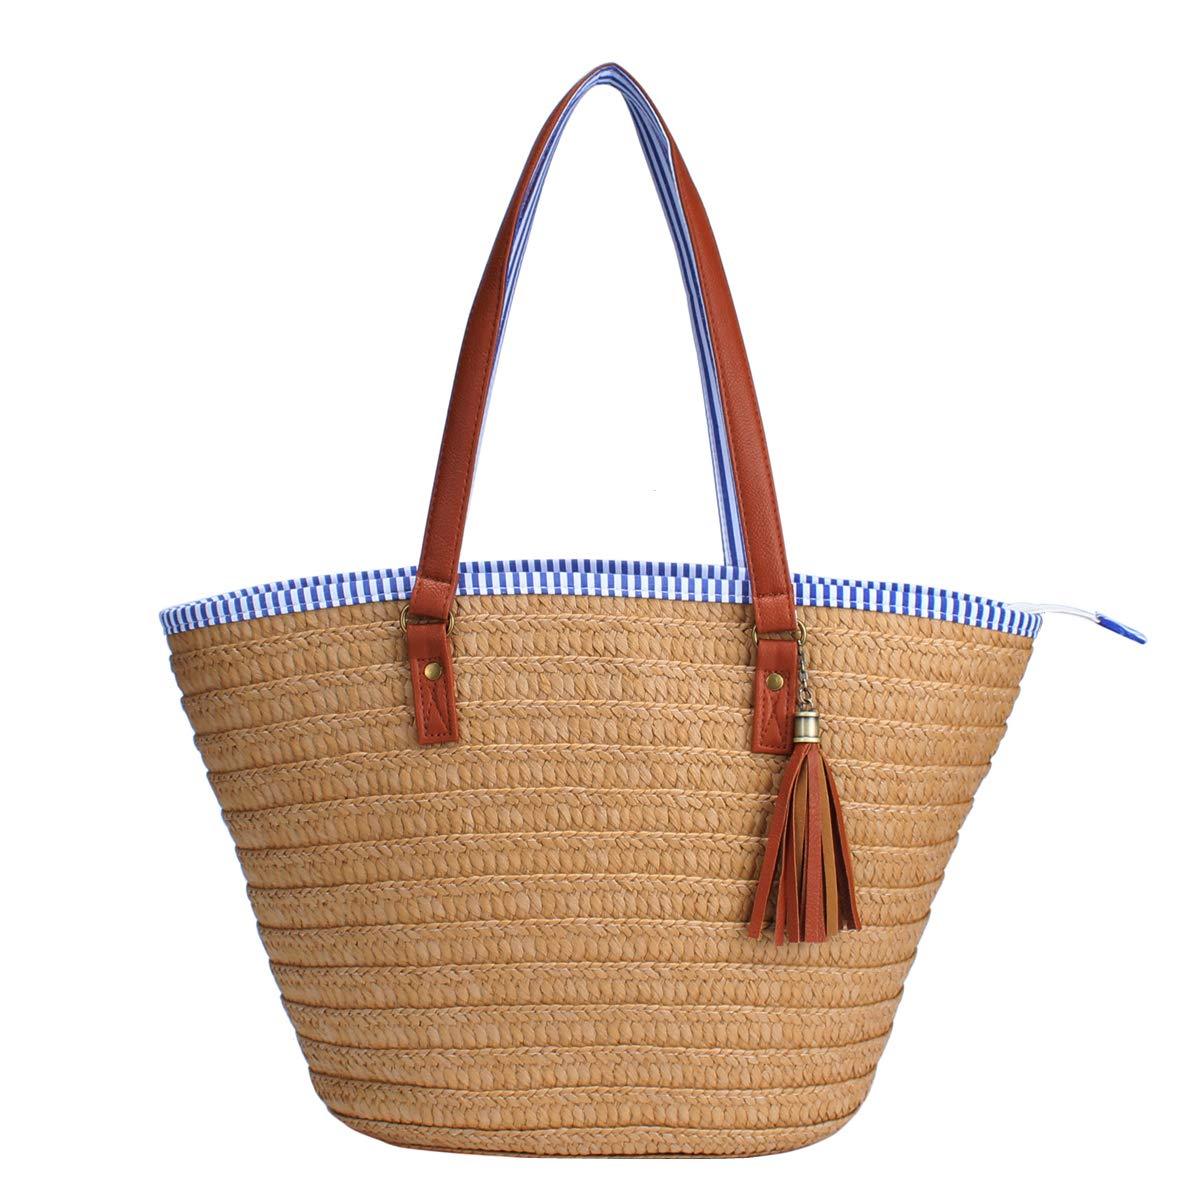 Sornean Straw Beach Bag Handbags Shoulder Bag Tote Cotton Lining PU Leather Handle-Eco Friendly